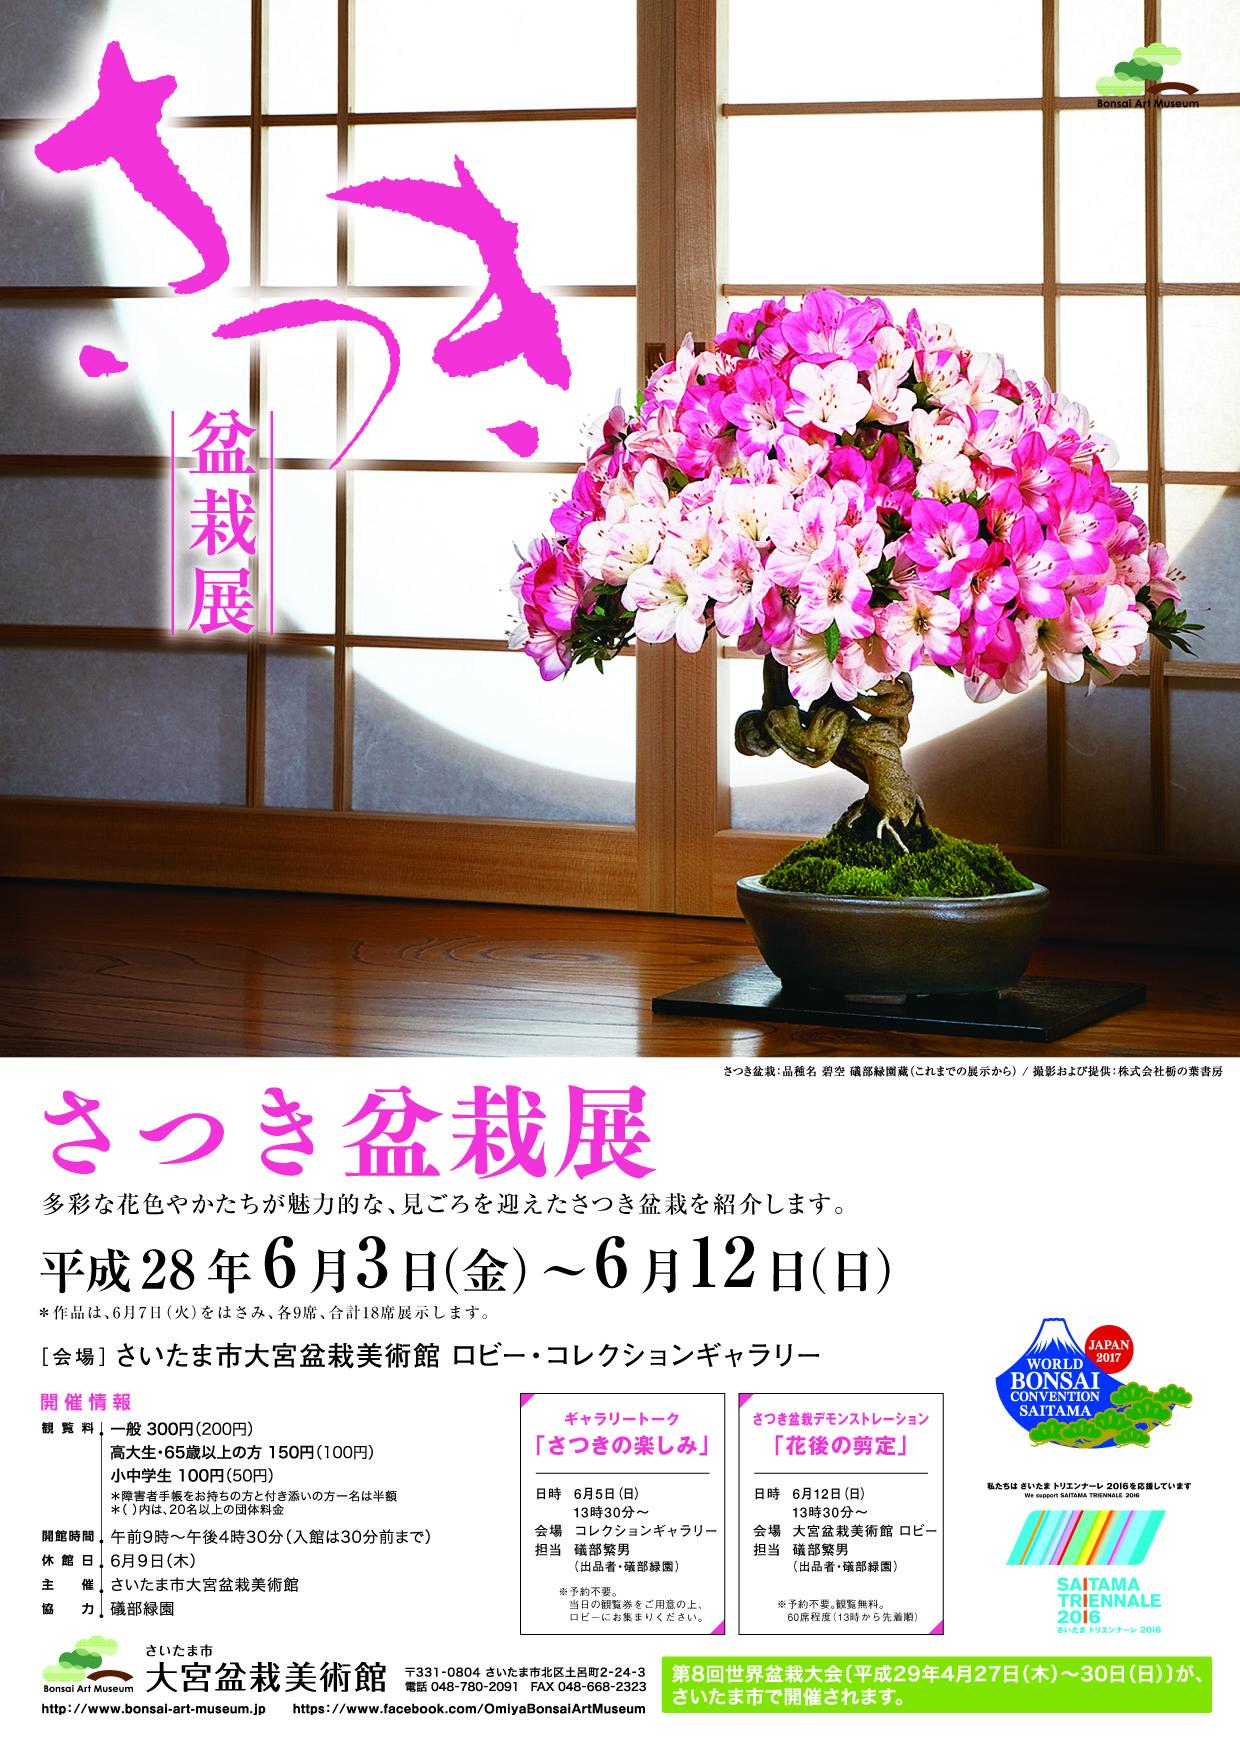 Satsuki (Azalea) Bonsai Exhibition